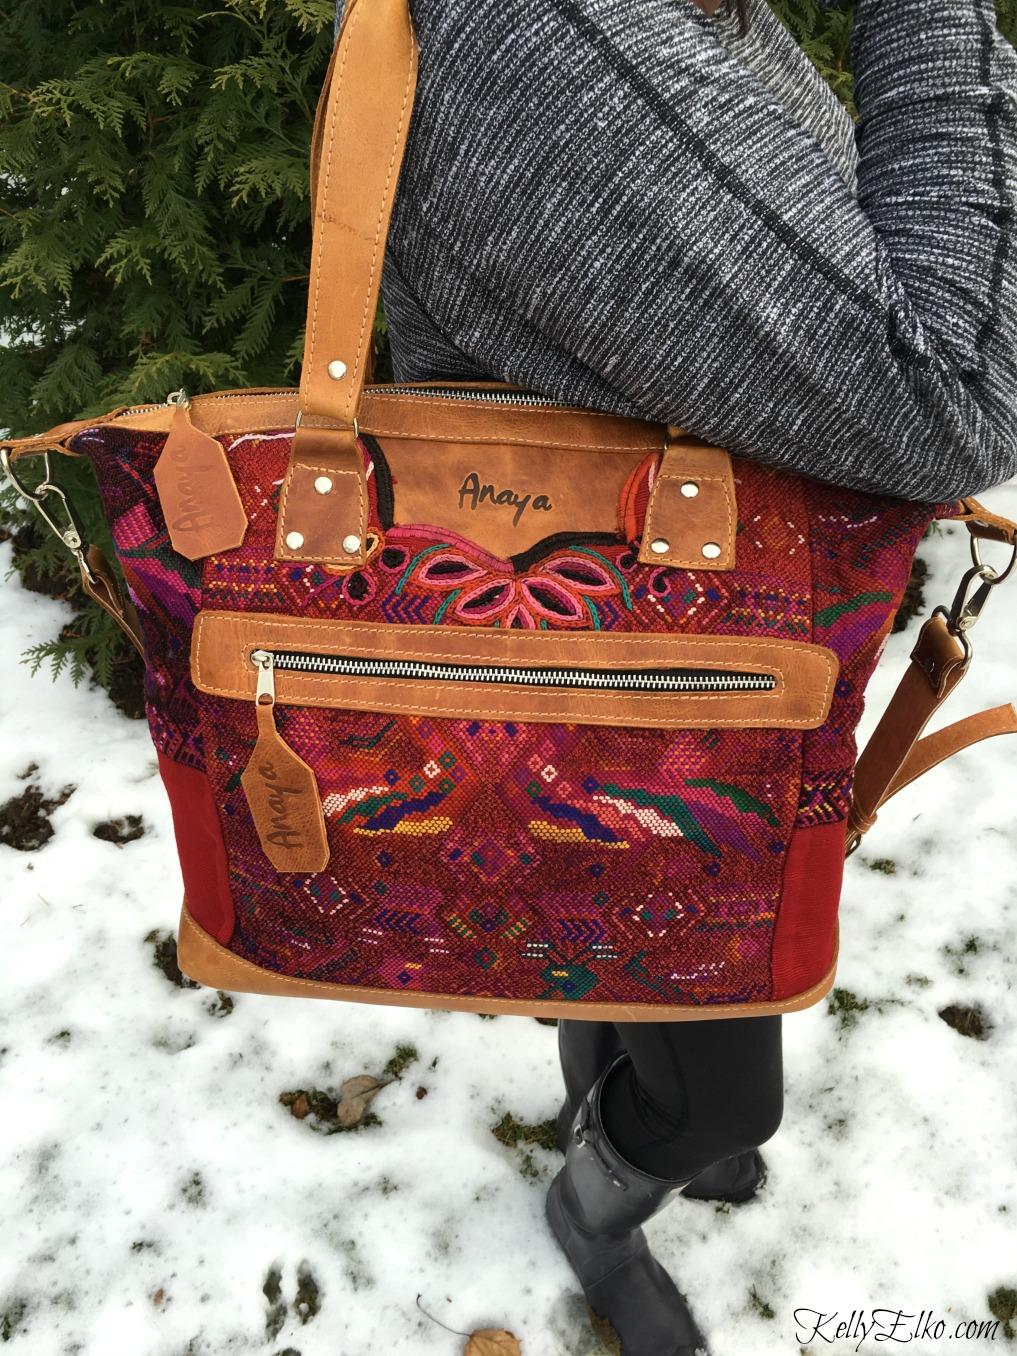 Anaya Camera Bag with Vintage Fabric - makes the perfect purse kellyelko.com